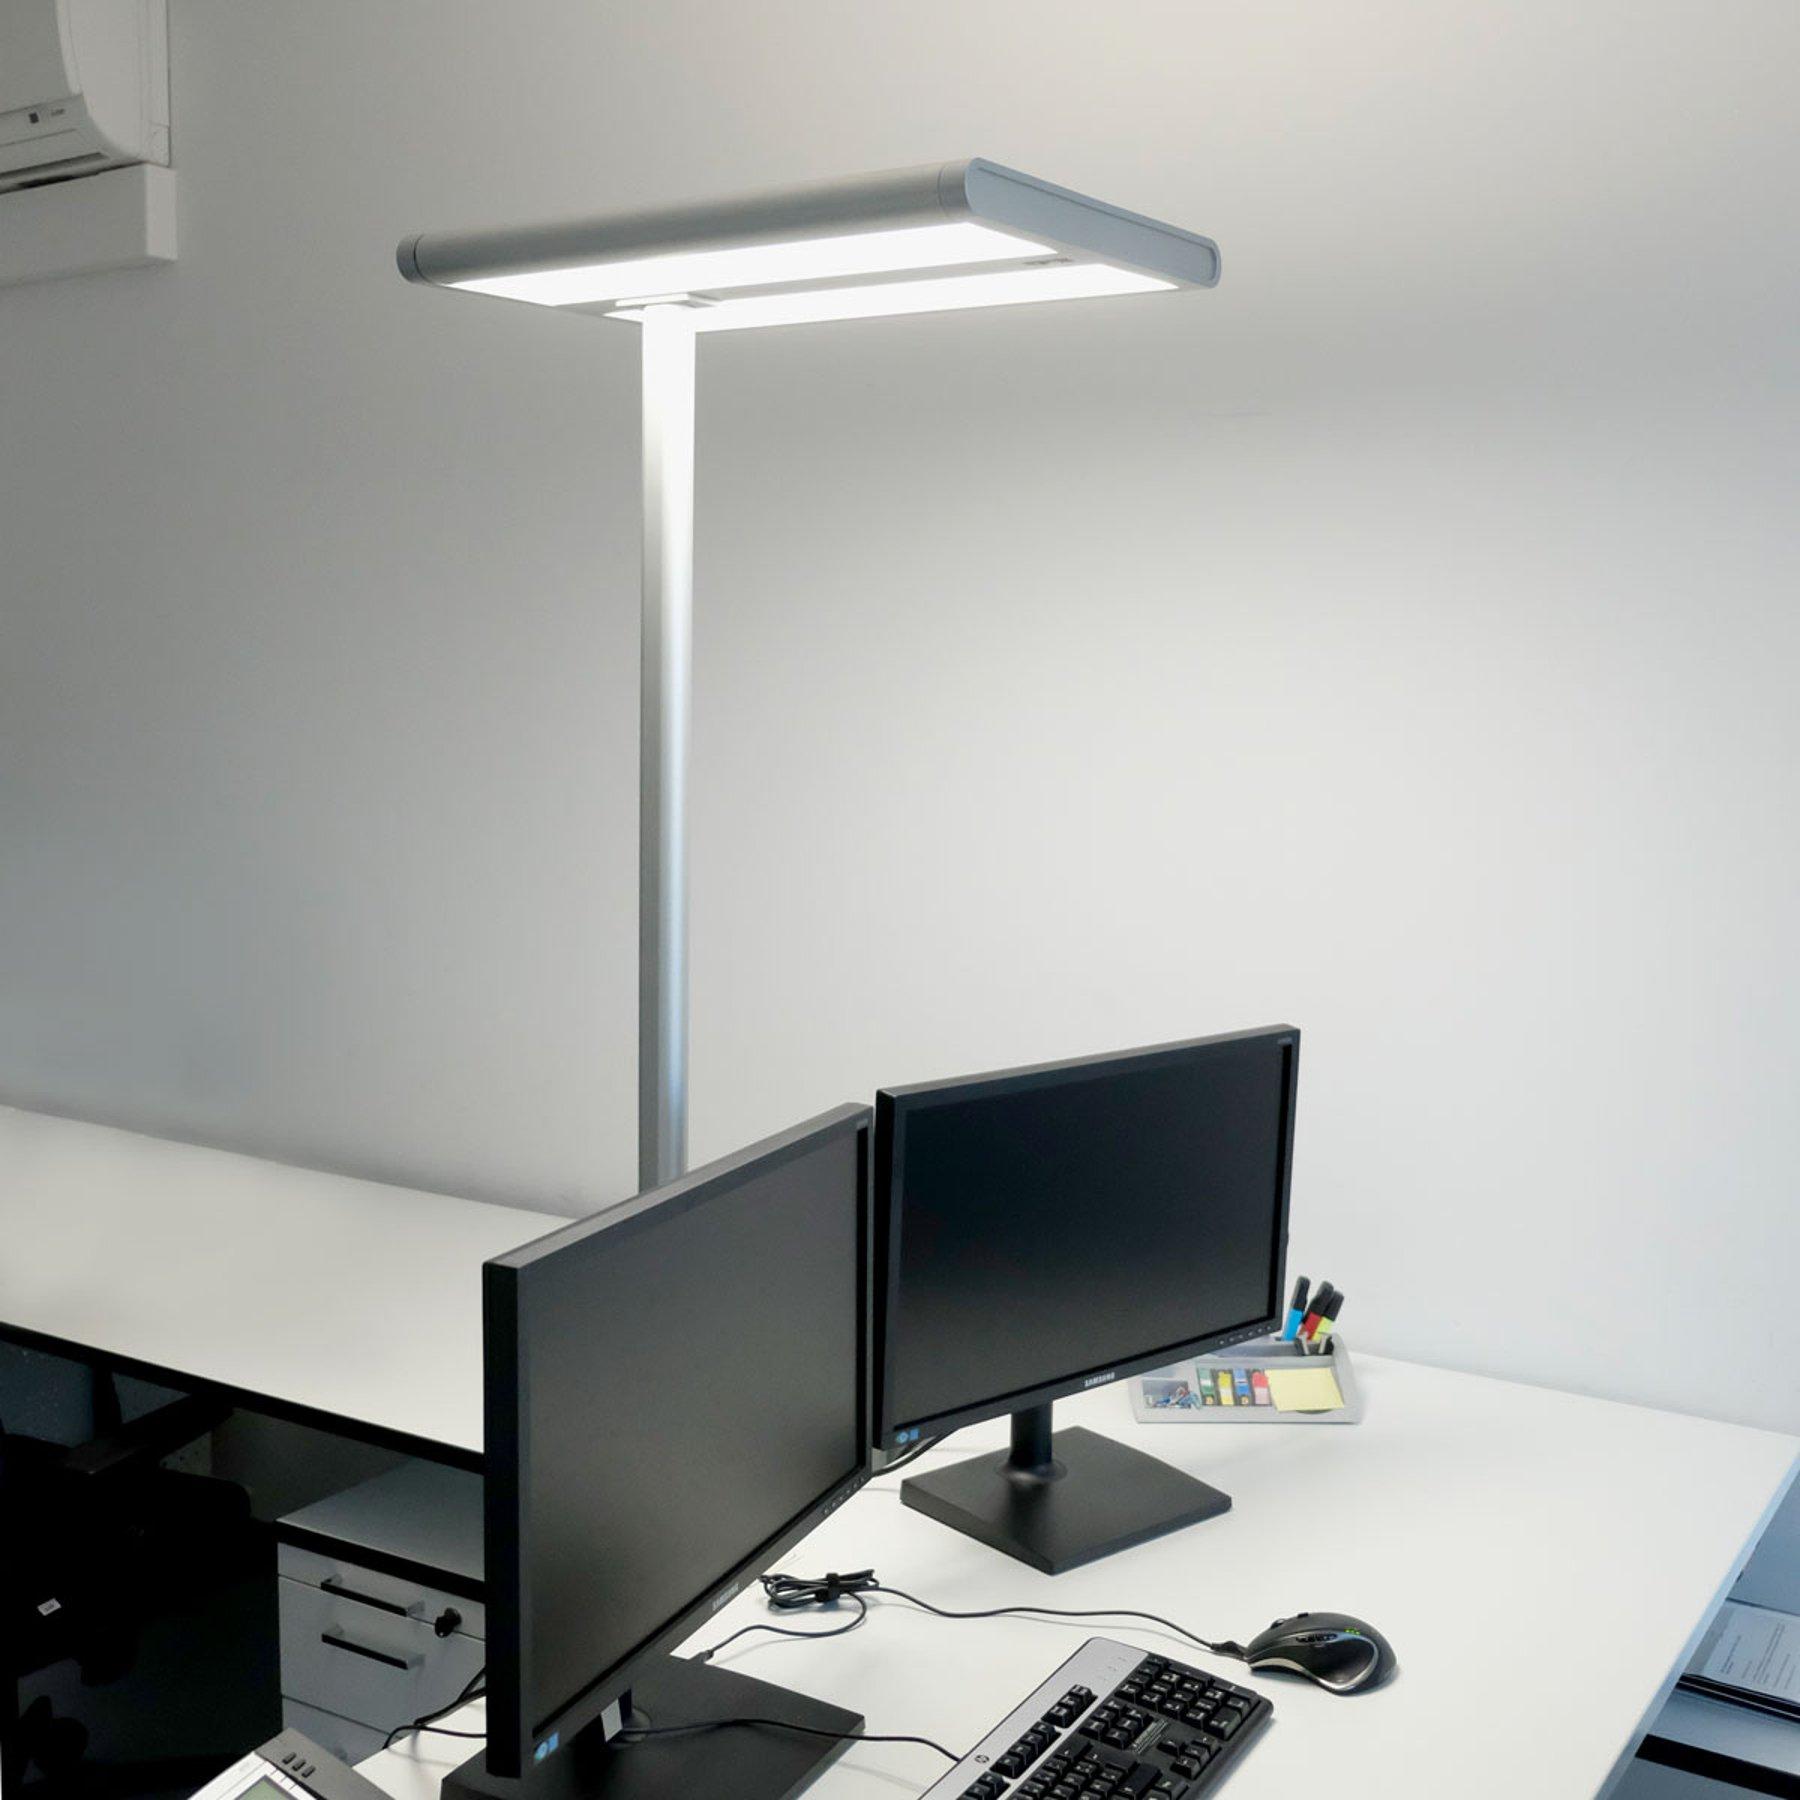 Quirin - LED-gulvlampe til kontoret, med sensor